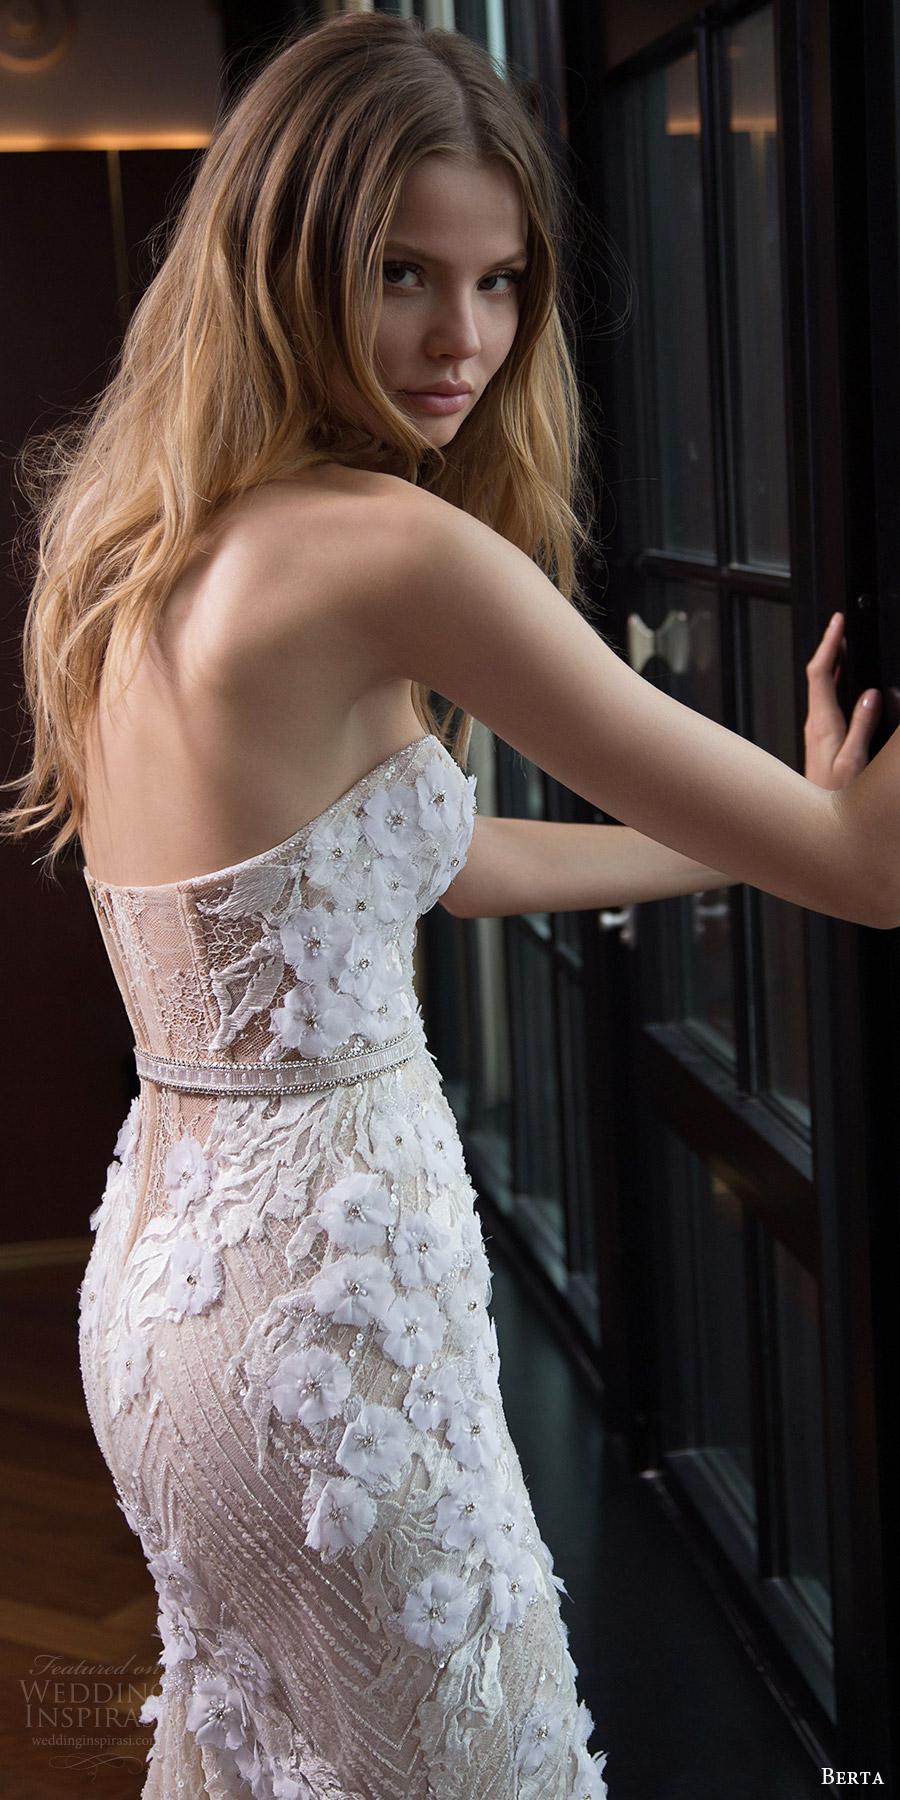 berta bridal fall 2016 strapless sweetheart trumpet wedding dress (16 104) bv